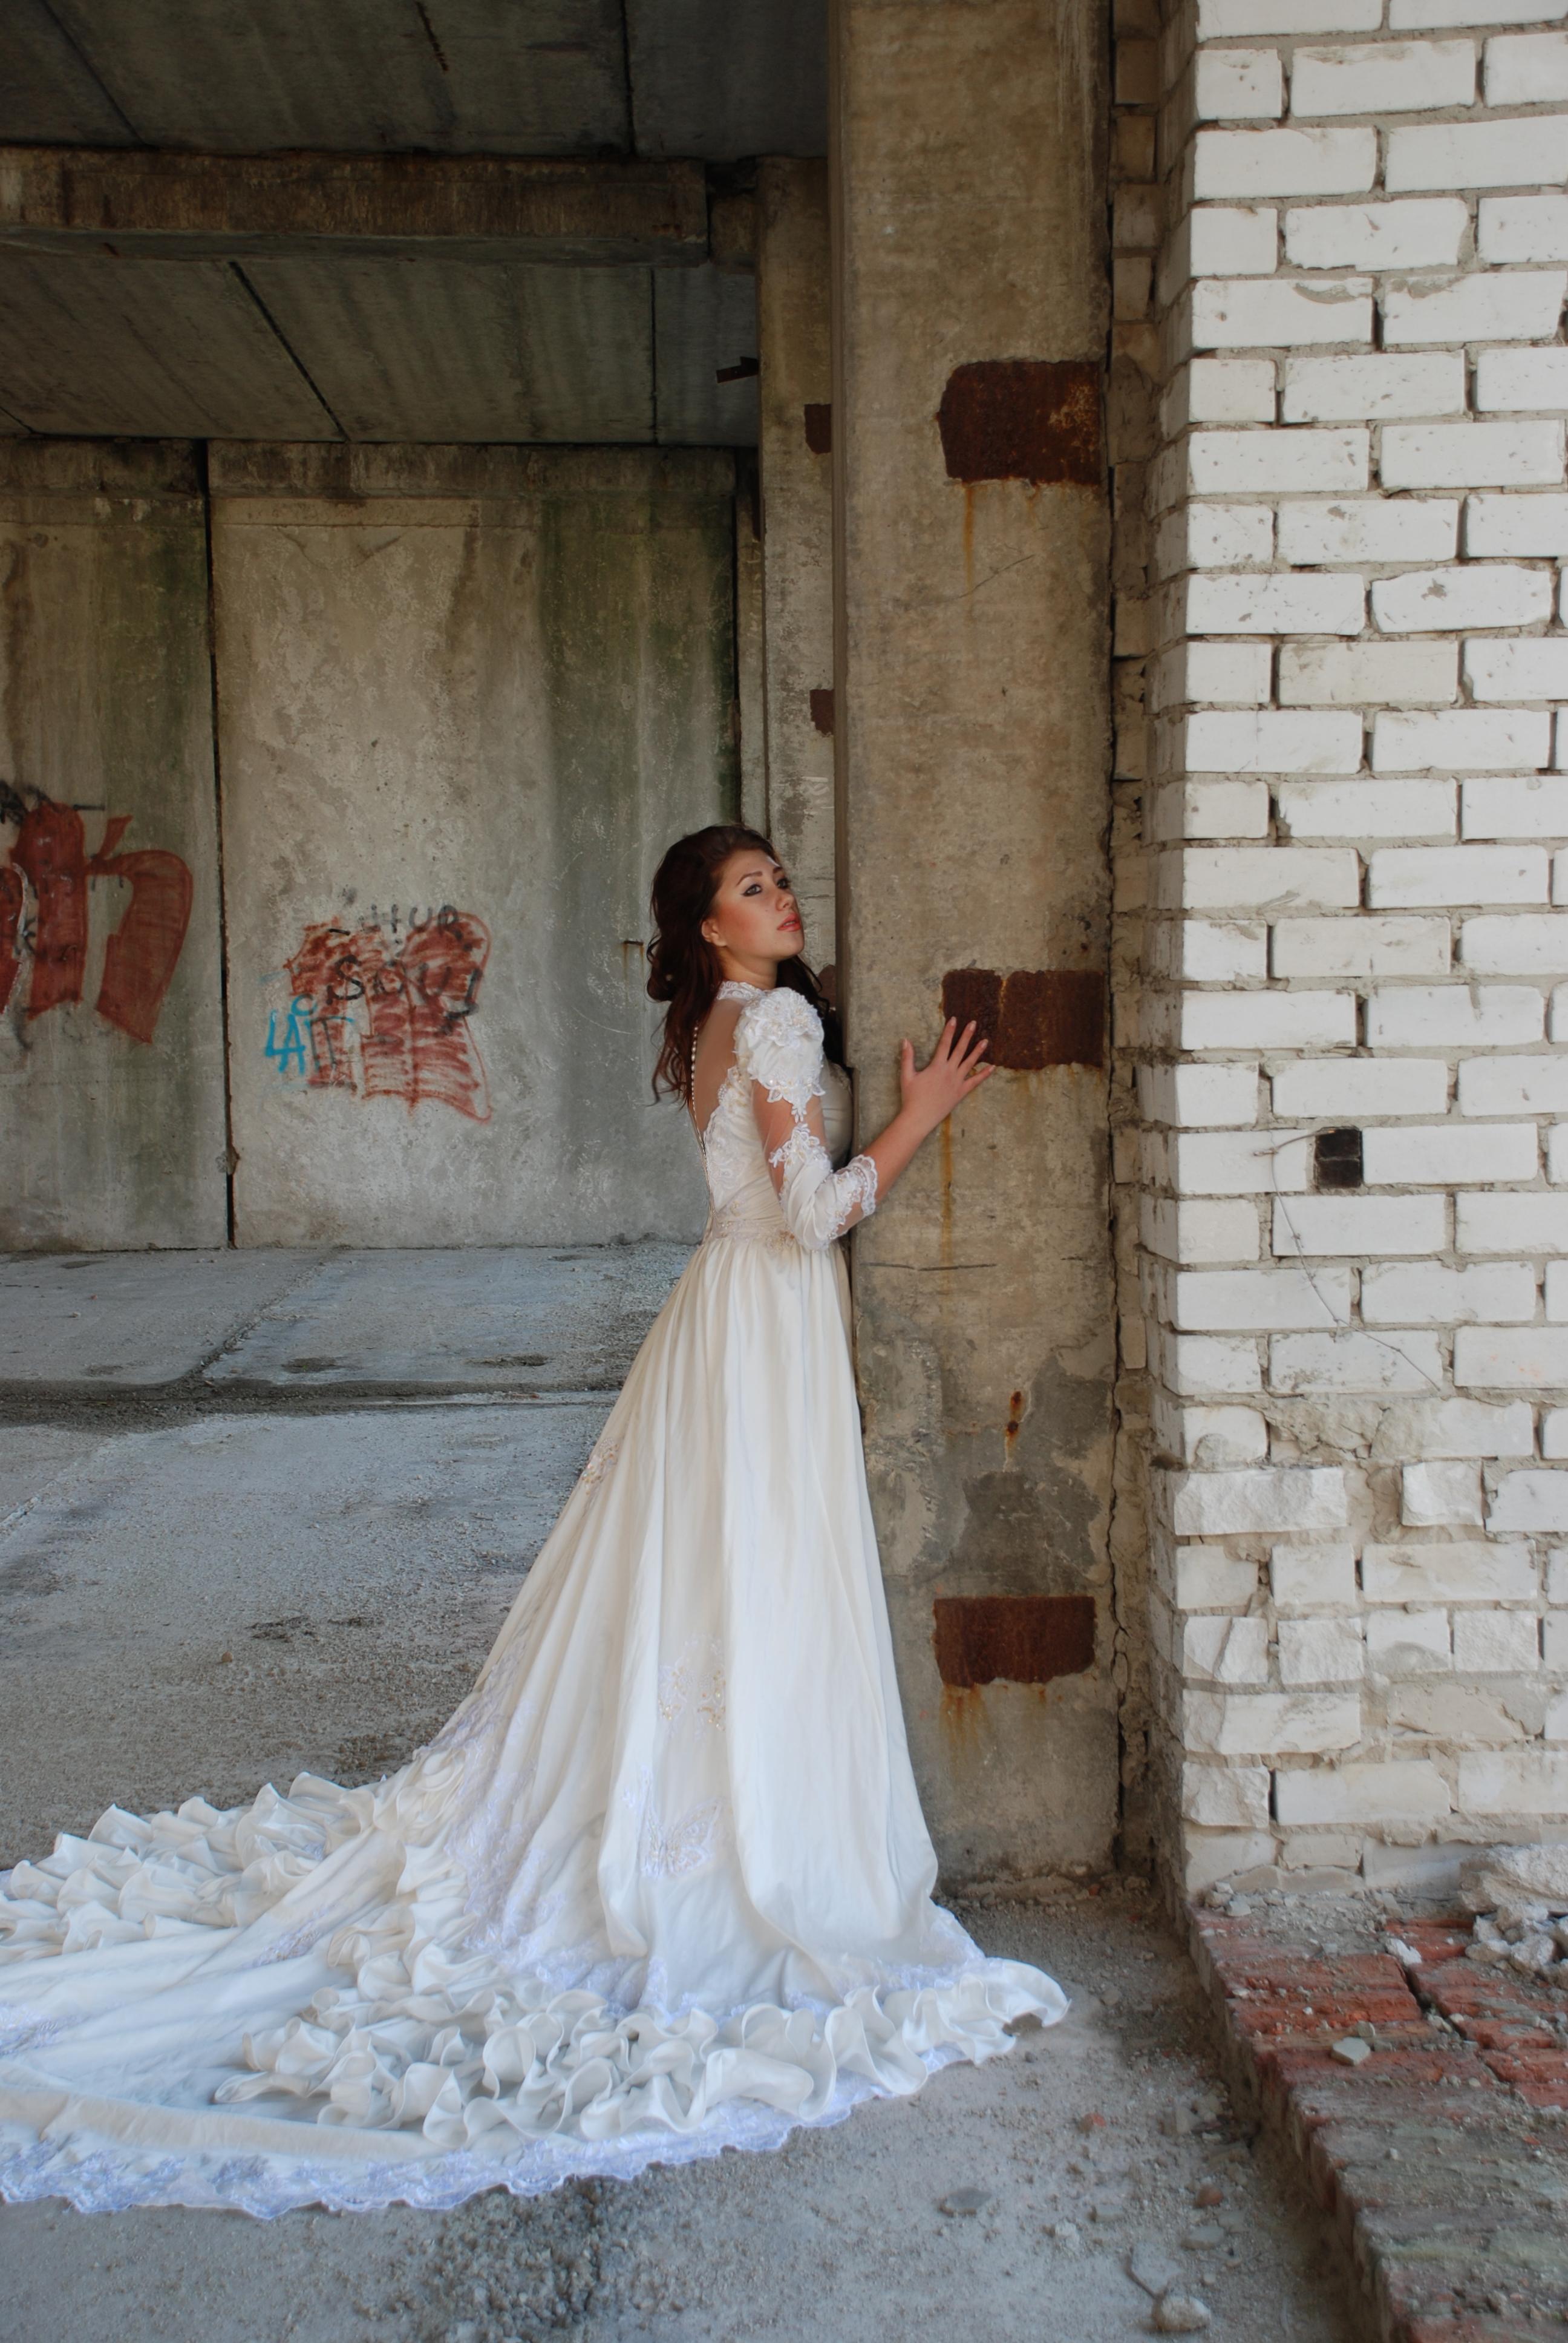 The sad bride_6 by anastasiya-landa